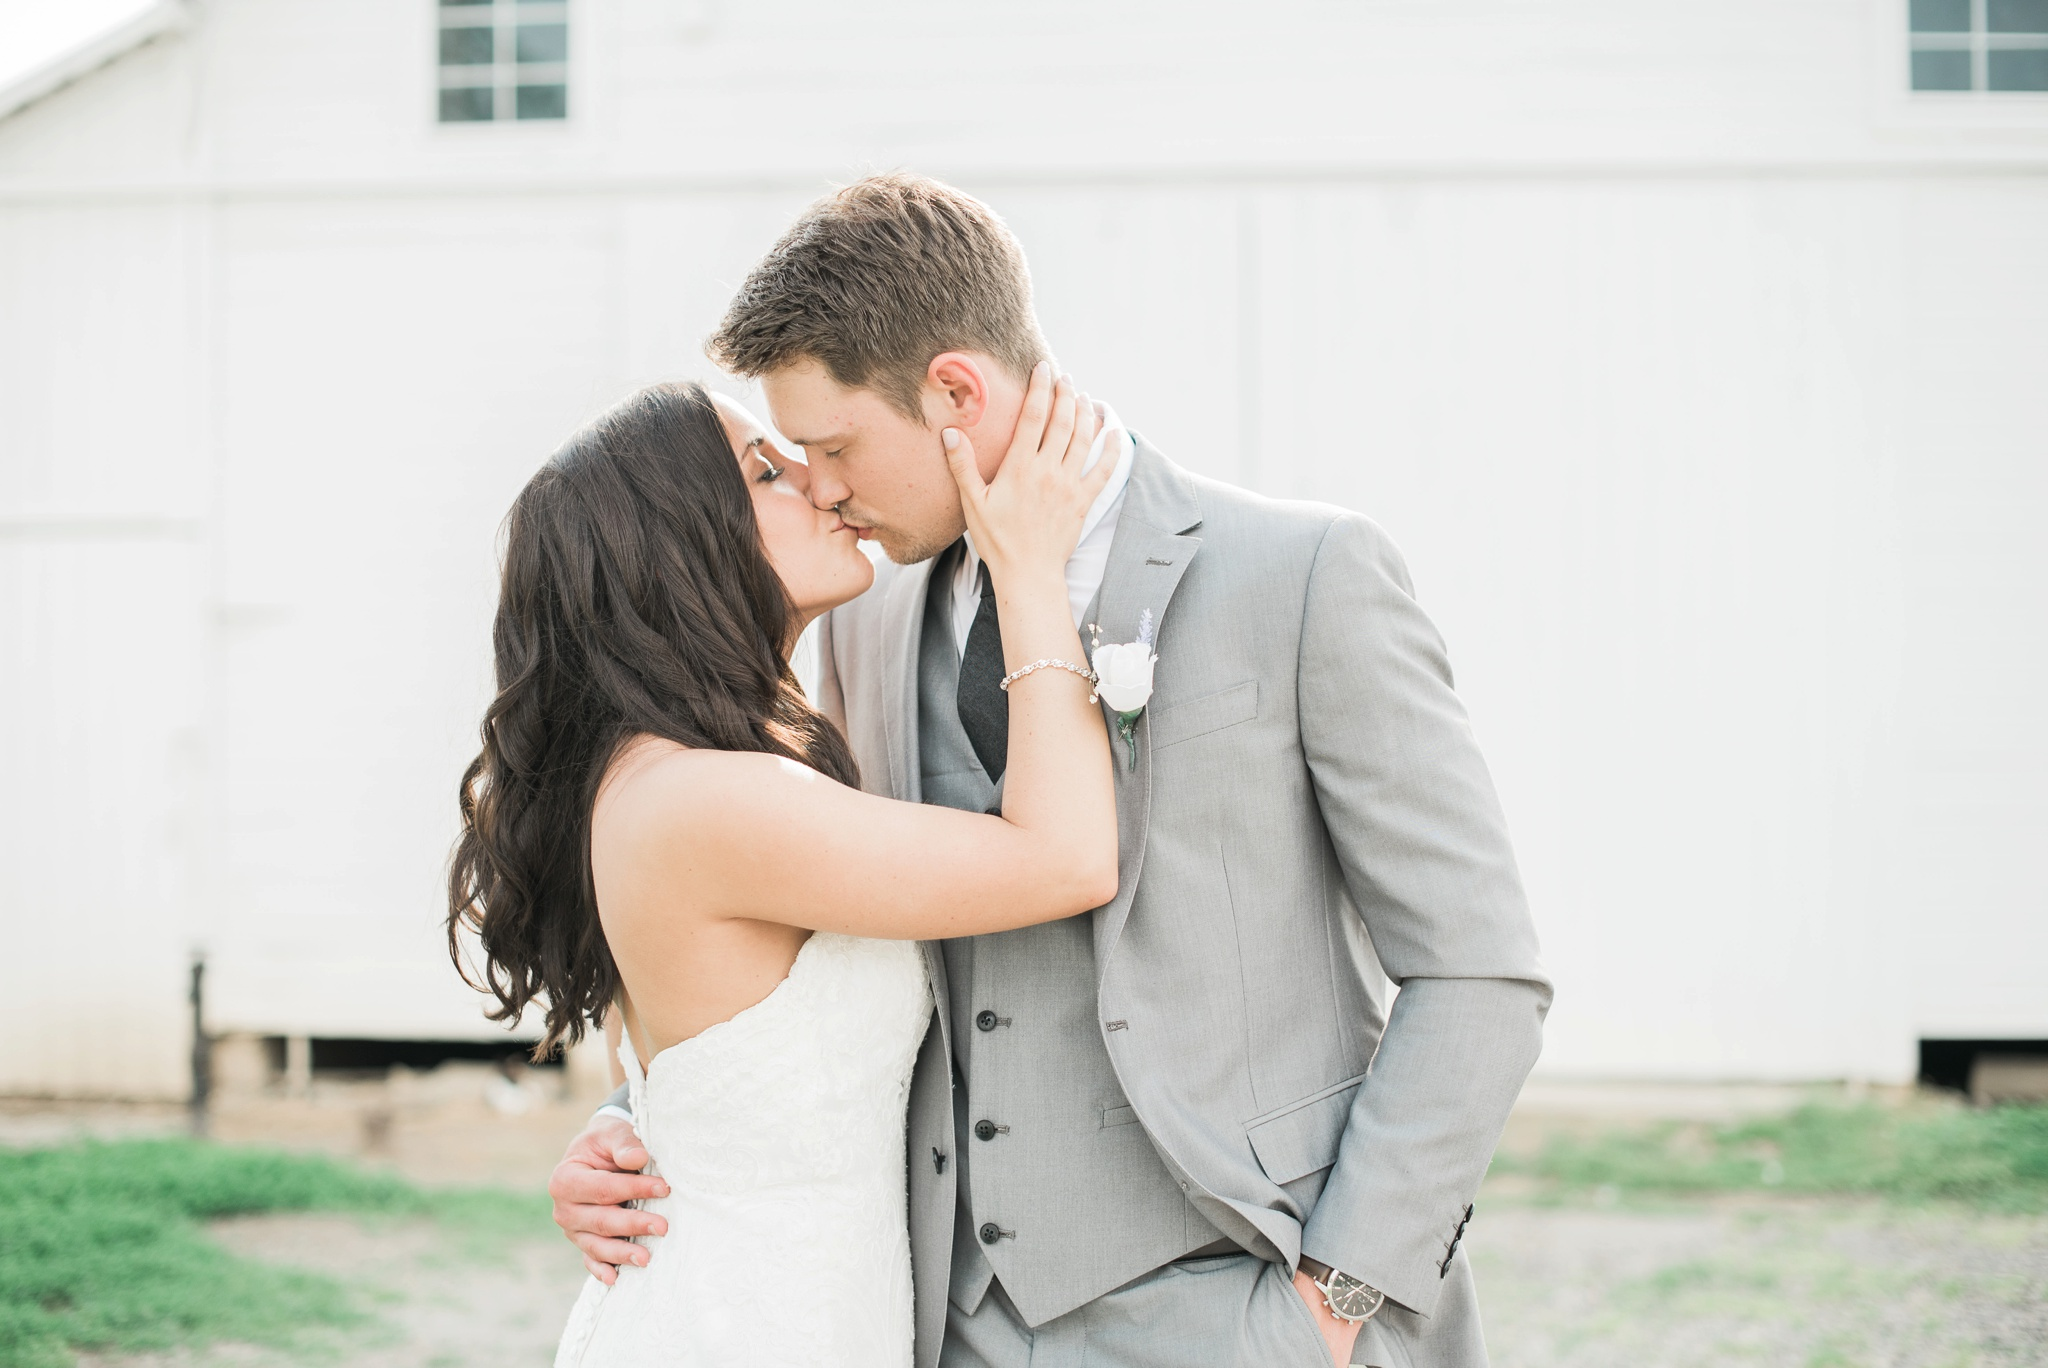 niederman-farm-wedding-cincinnati-ohio-photographer_0075.jpg